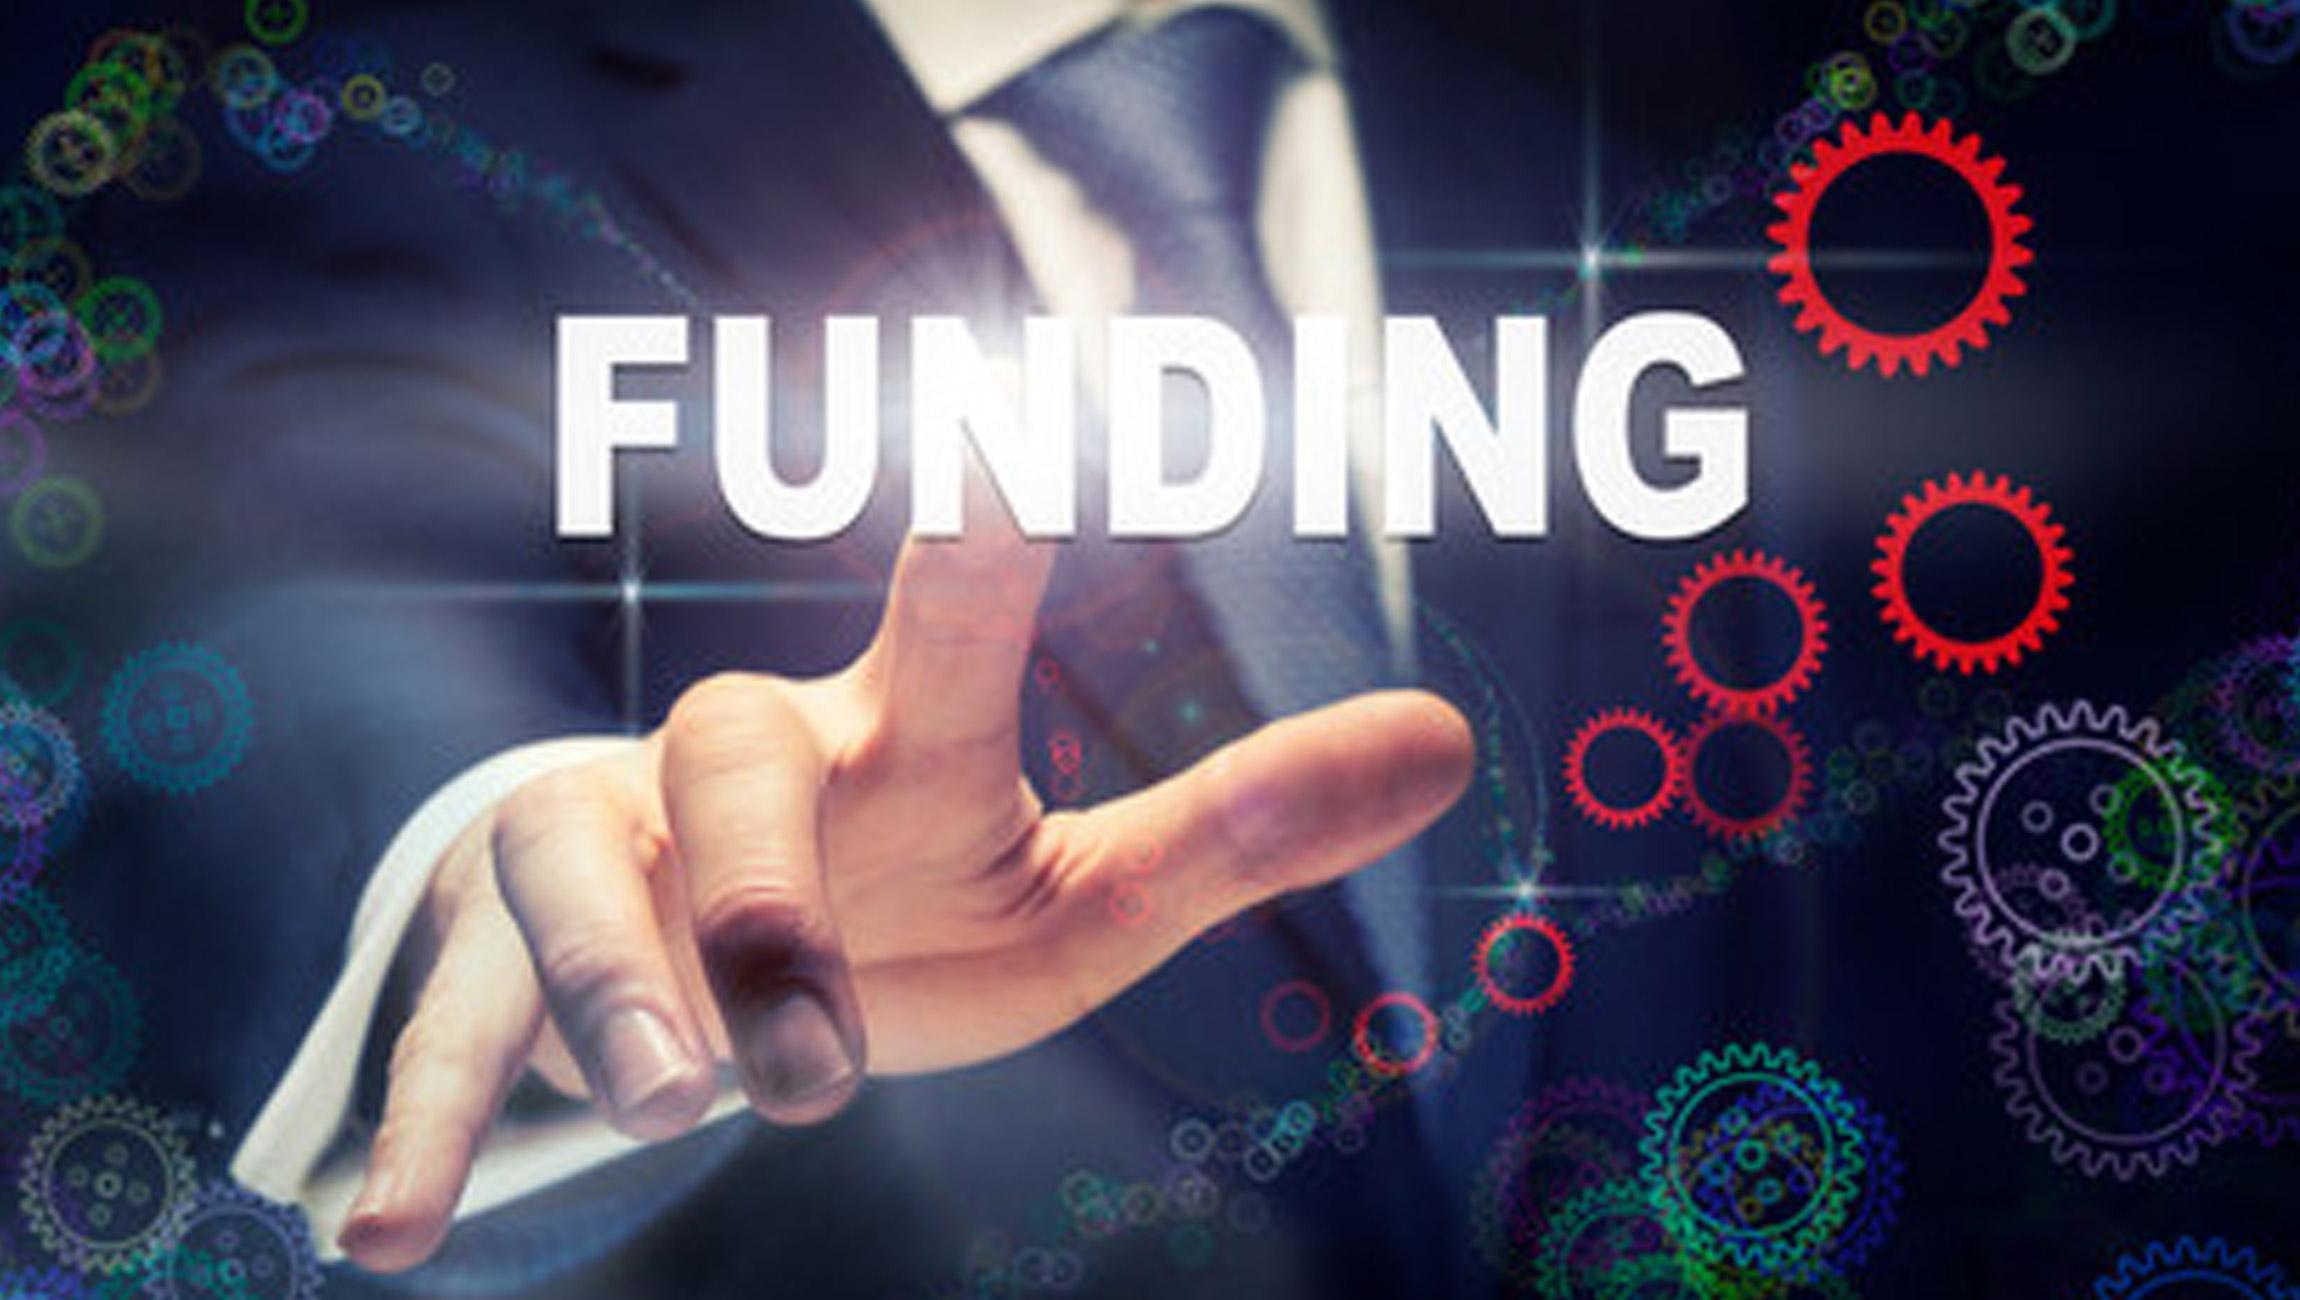 AppTweak Raises $22 Million in Series B Funding to Grow App Store Optimization (ASO) Platform Worldwide